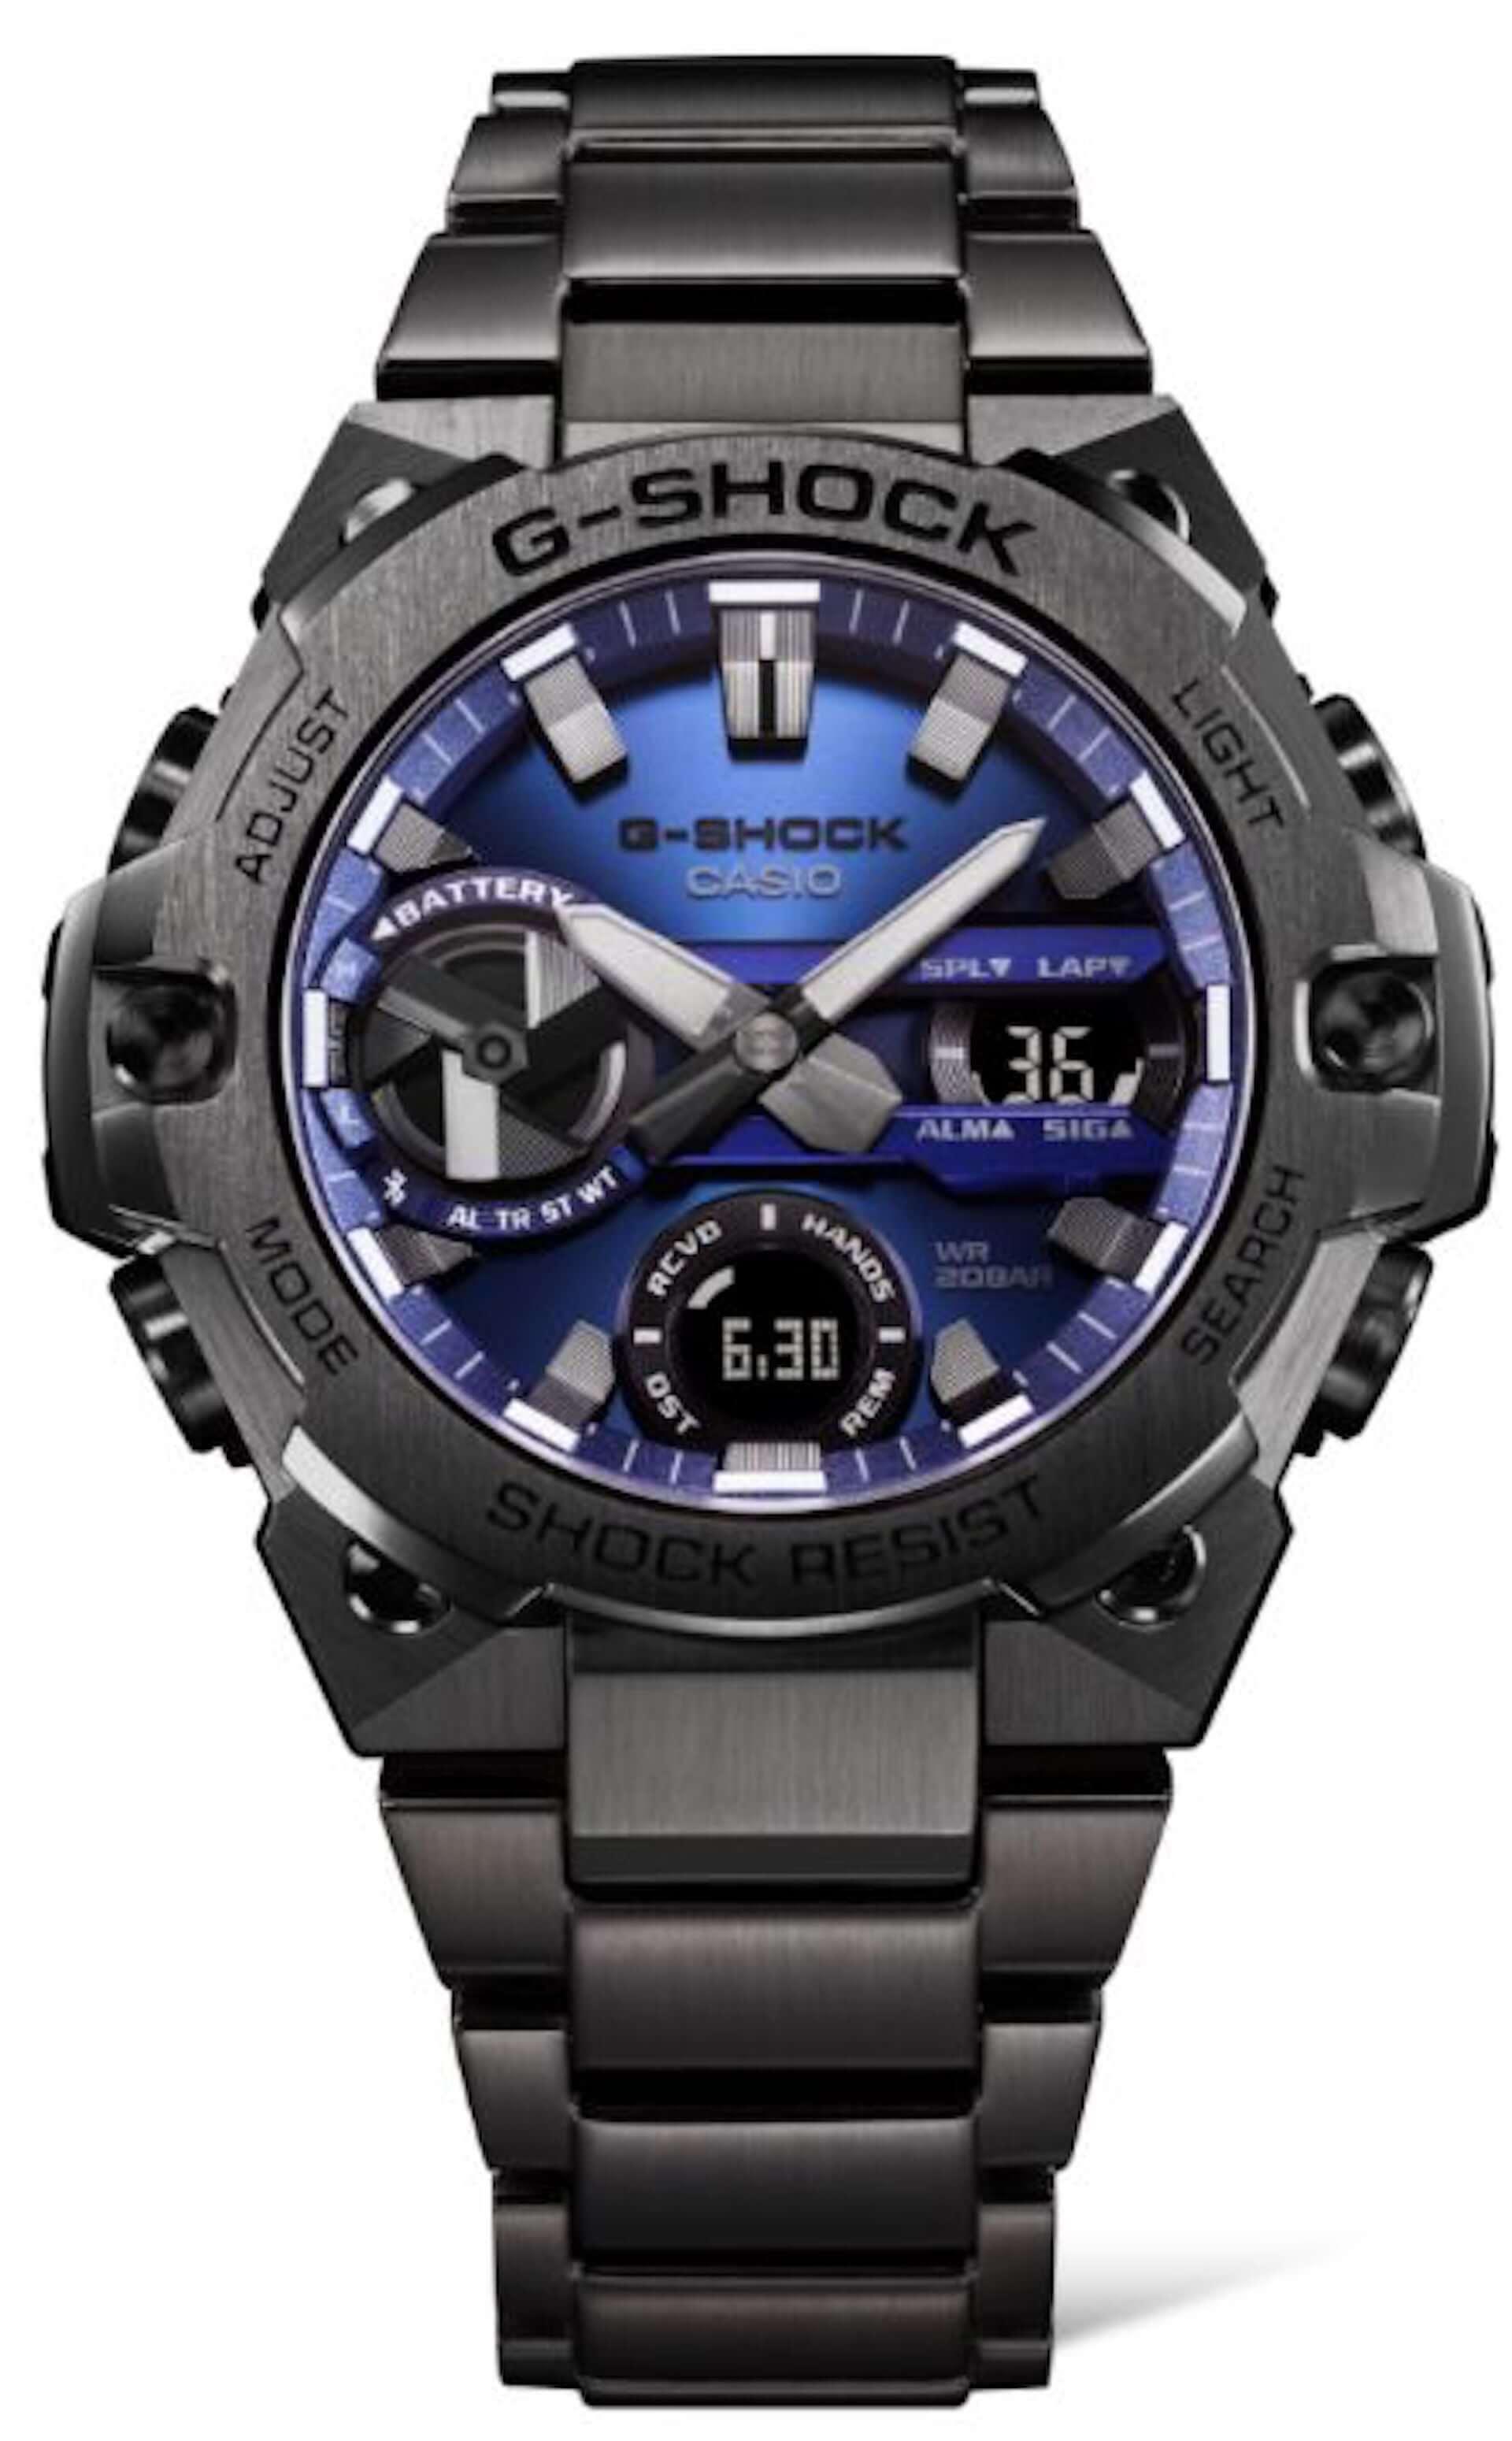 G-SHOCKから『G-STEEL』シリーズ最薄モデル『GST-B400』が新登場!個性的なブルーやレッドカラーも展開 tech210318_gshock_6-1920x3099